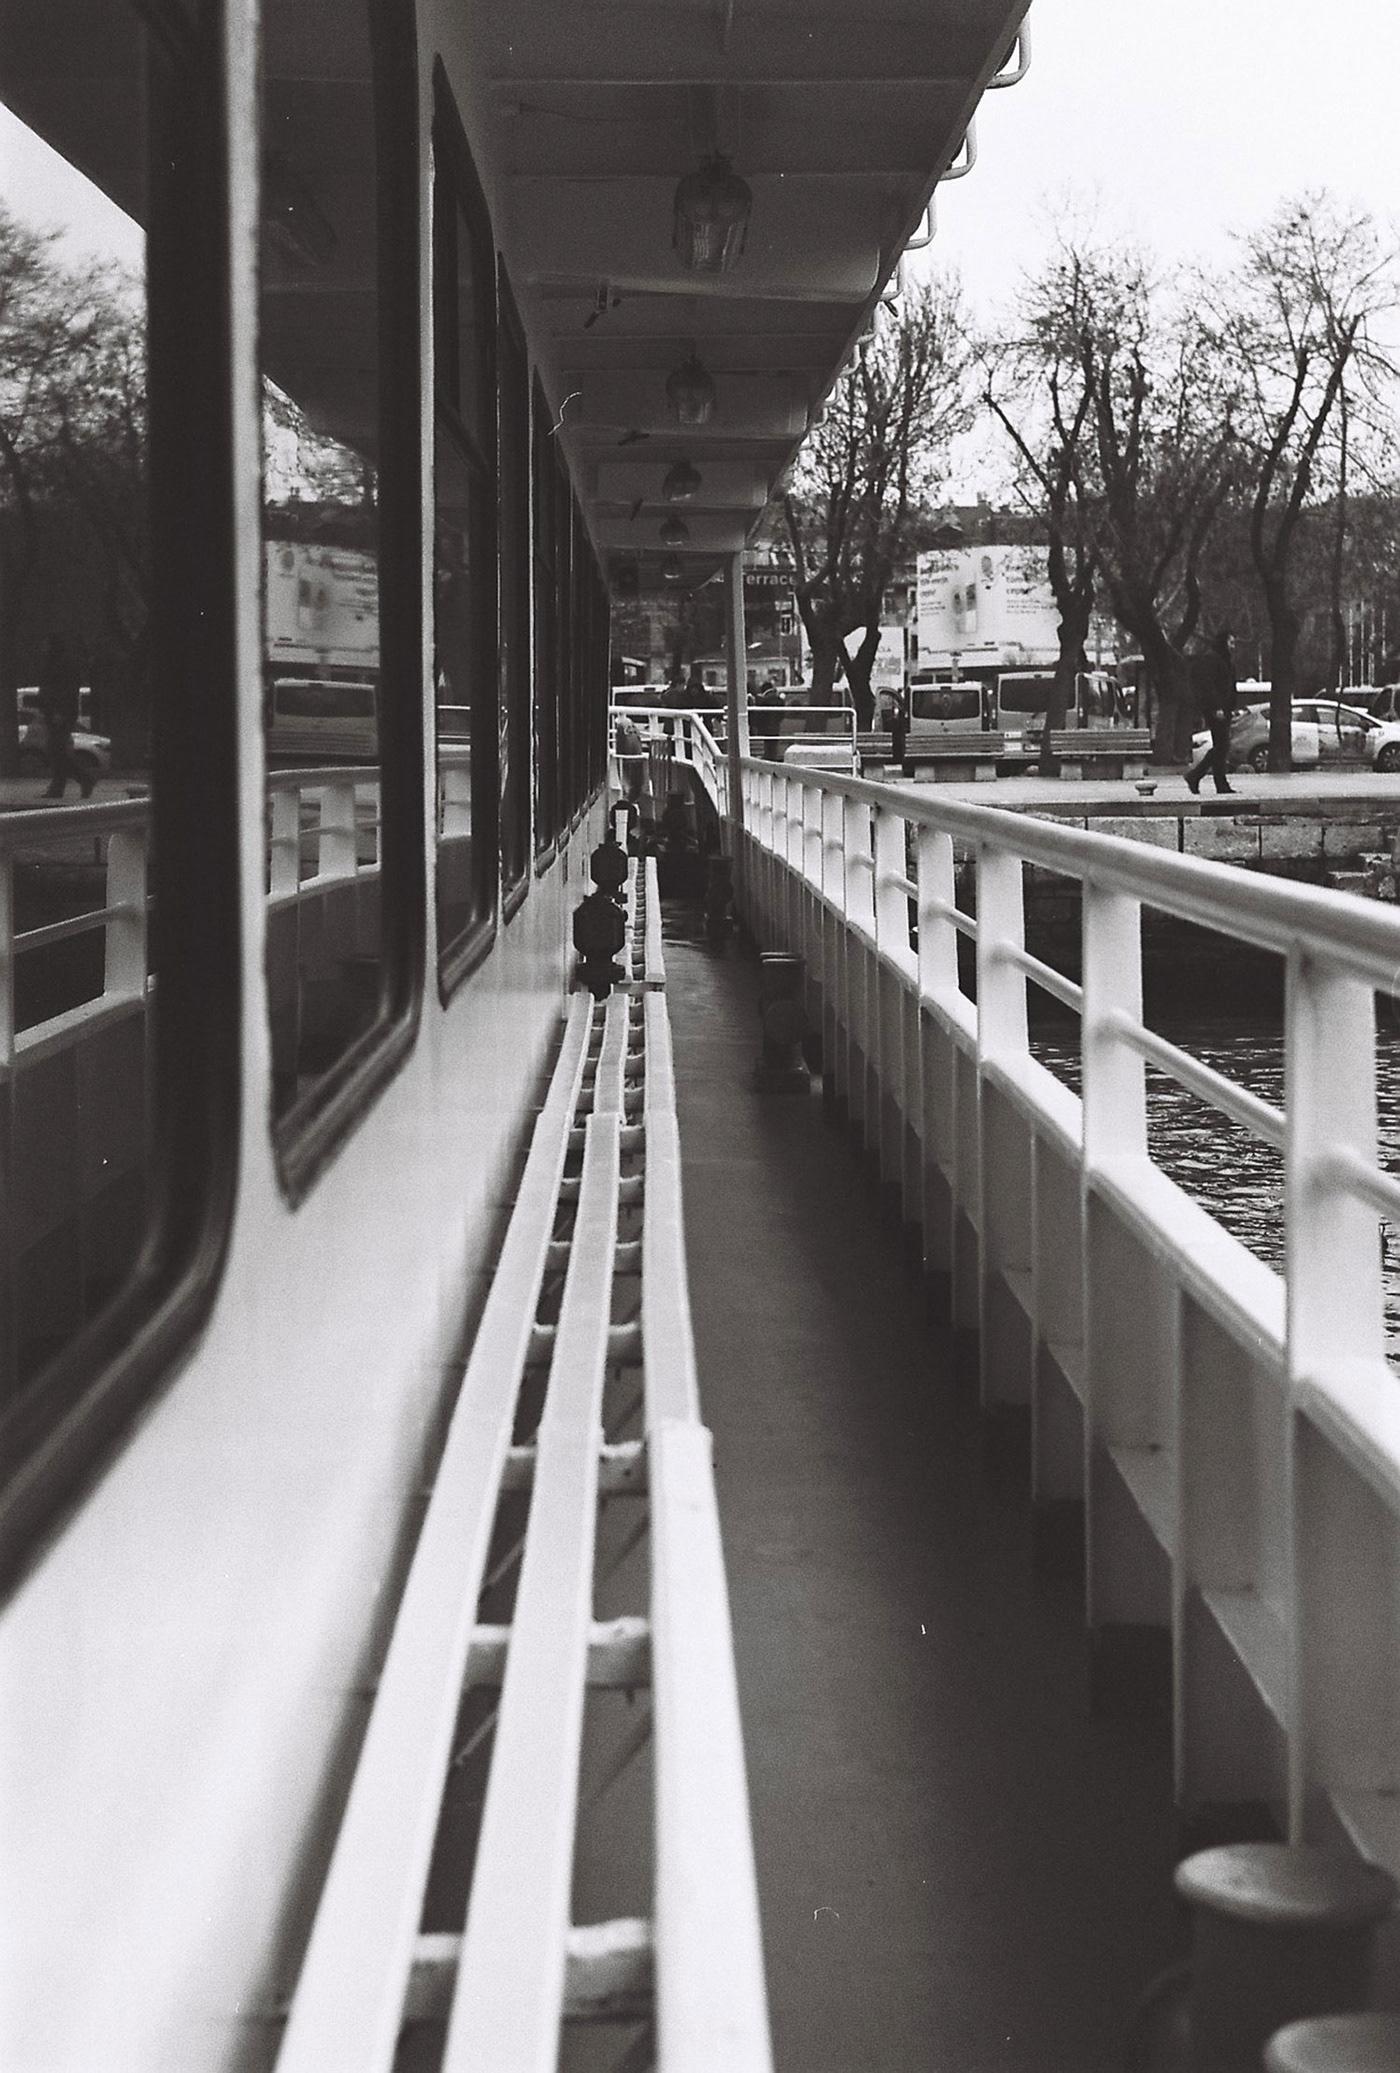 35mm film photography fotoğrafçılık ZENIT TTL fujifilm across 100 fujifilm analog camera fotograf Street